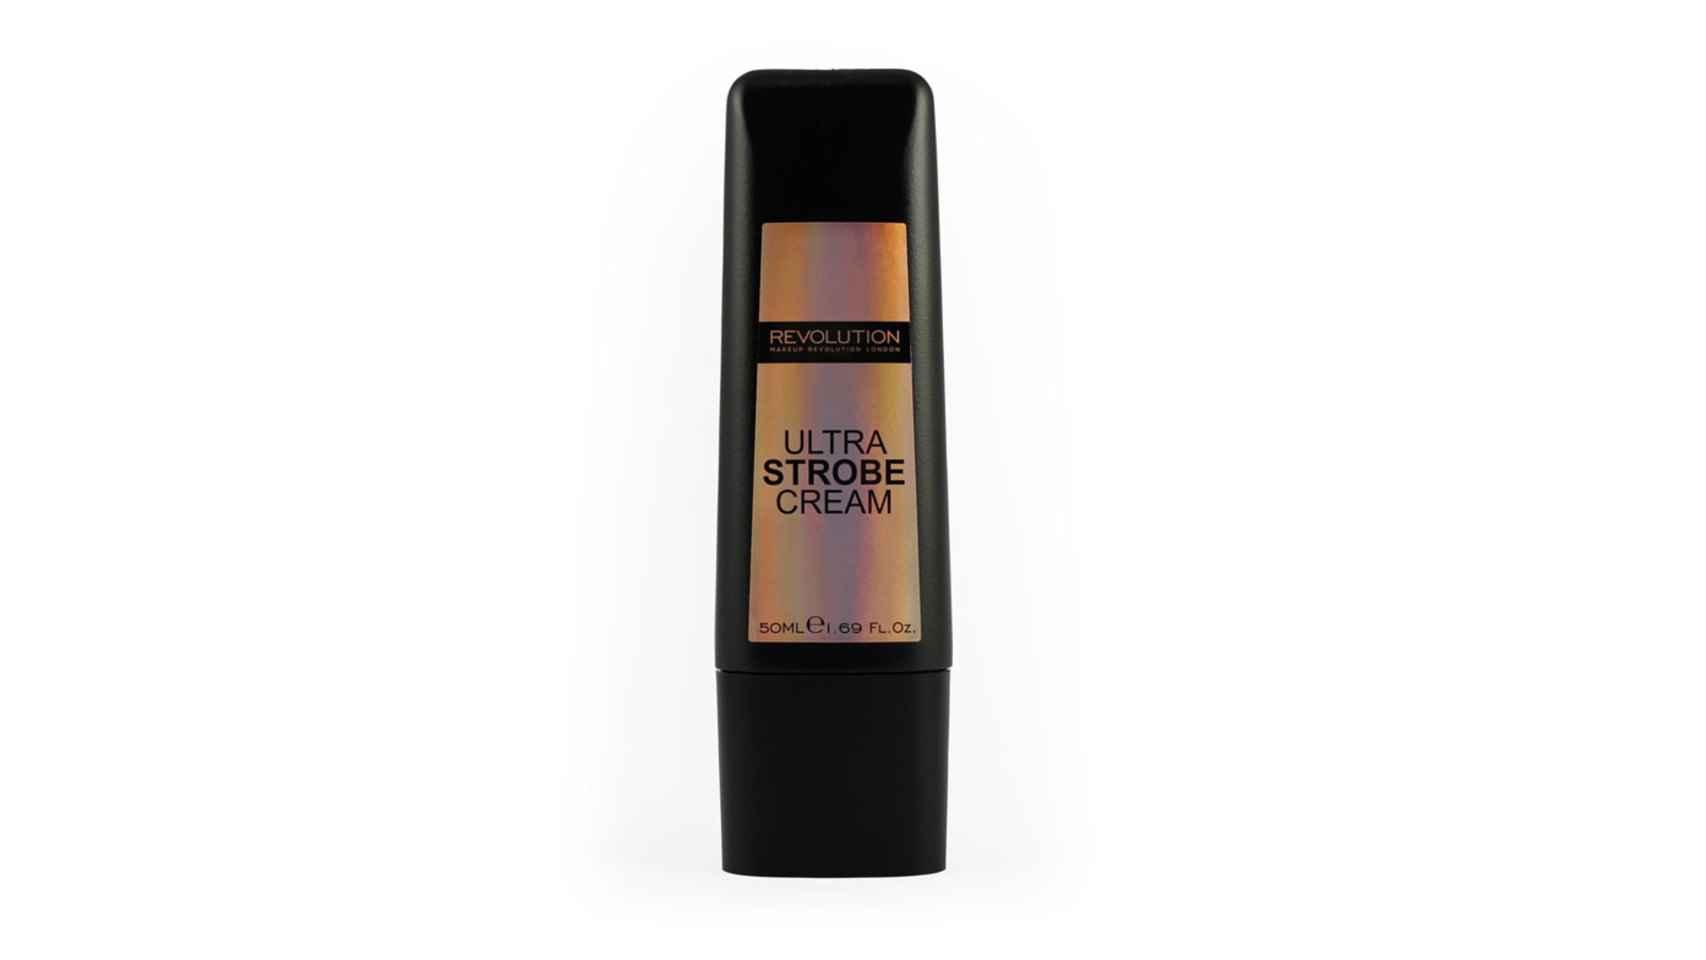 Iluminador fluido Ultra Strobe Cream de Makeup Revolution, 12€.